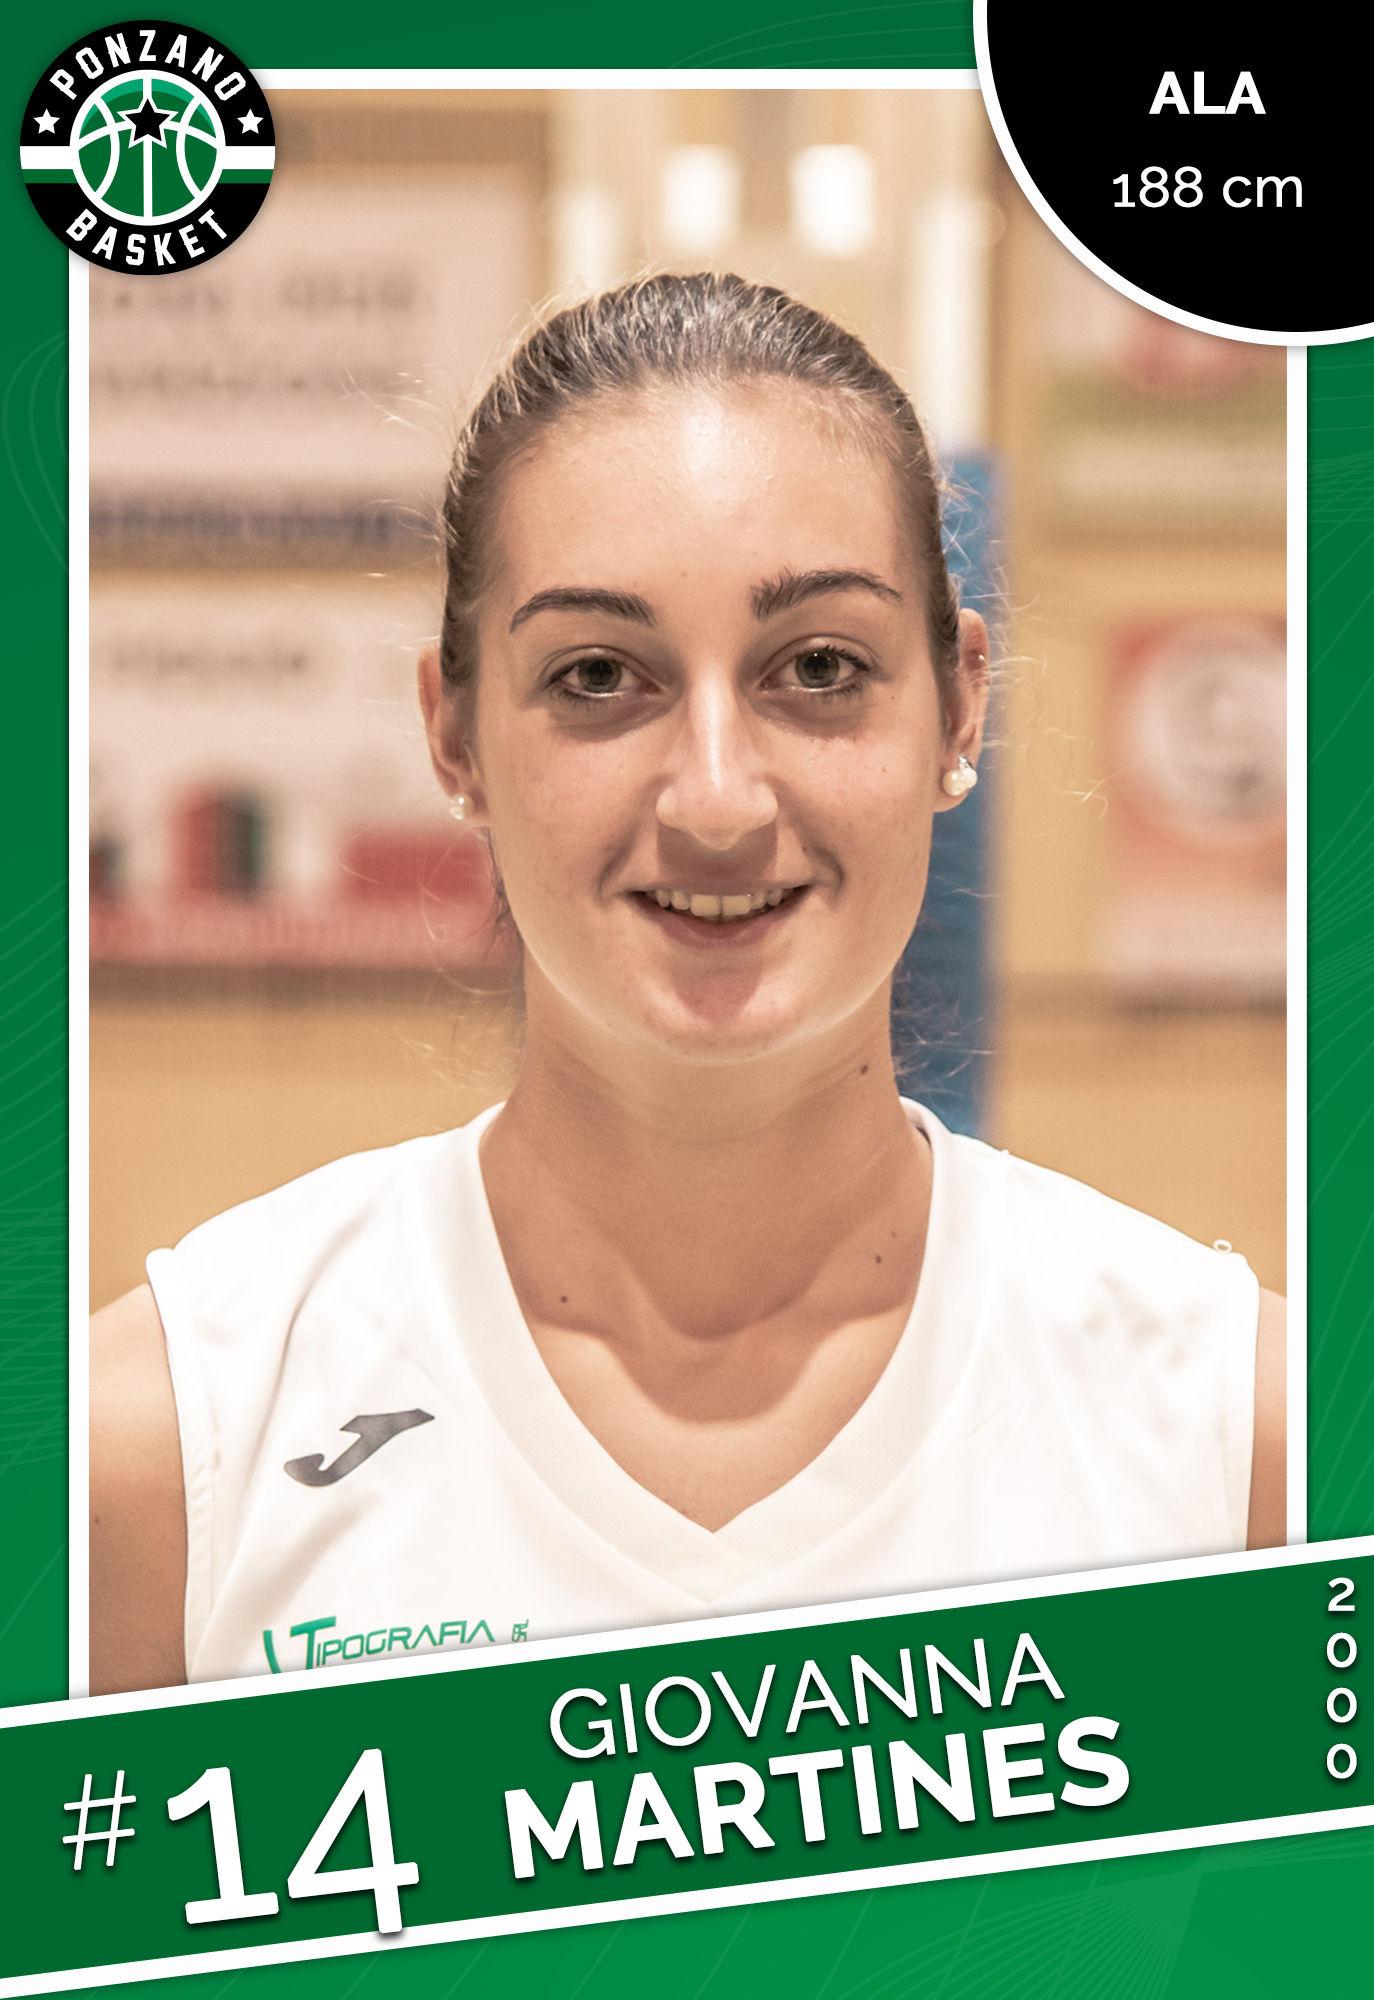 Giovanna Martines